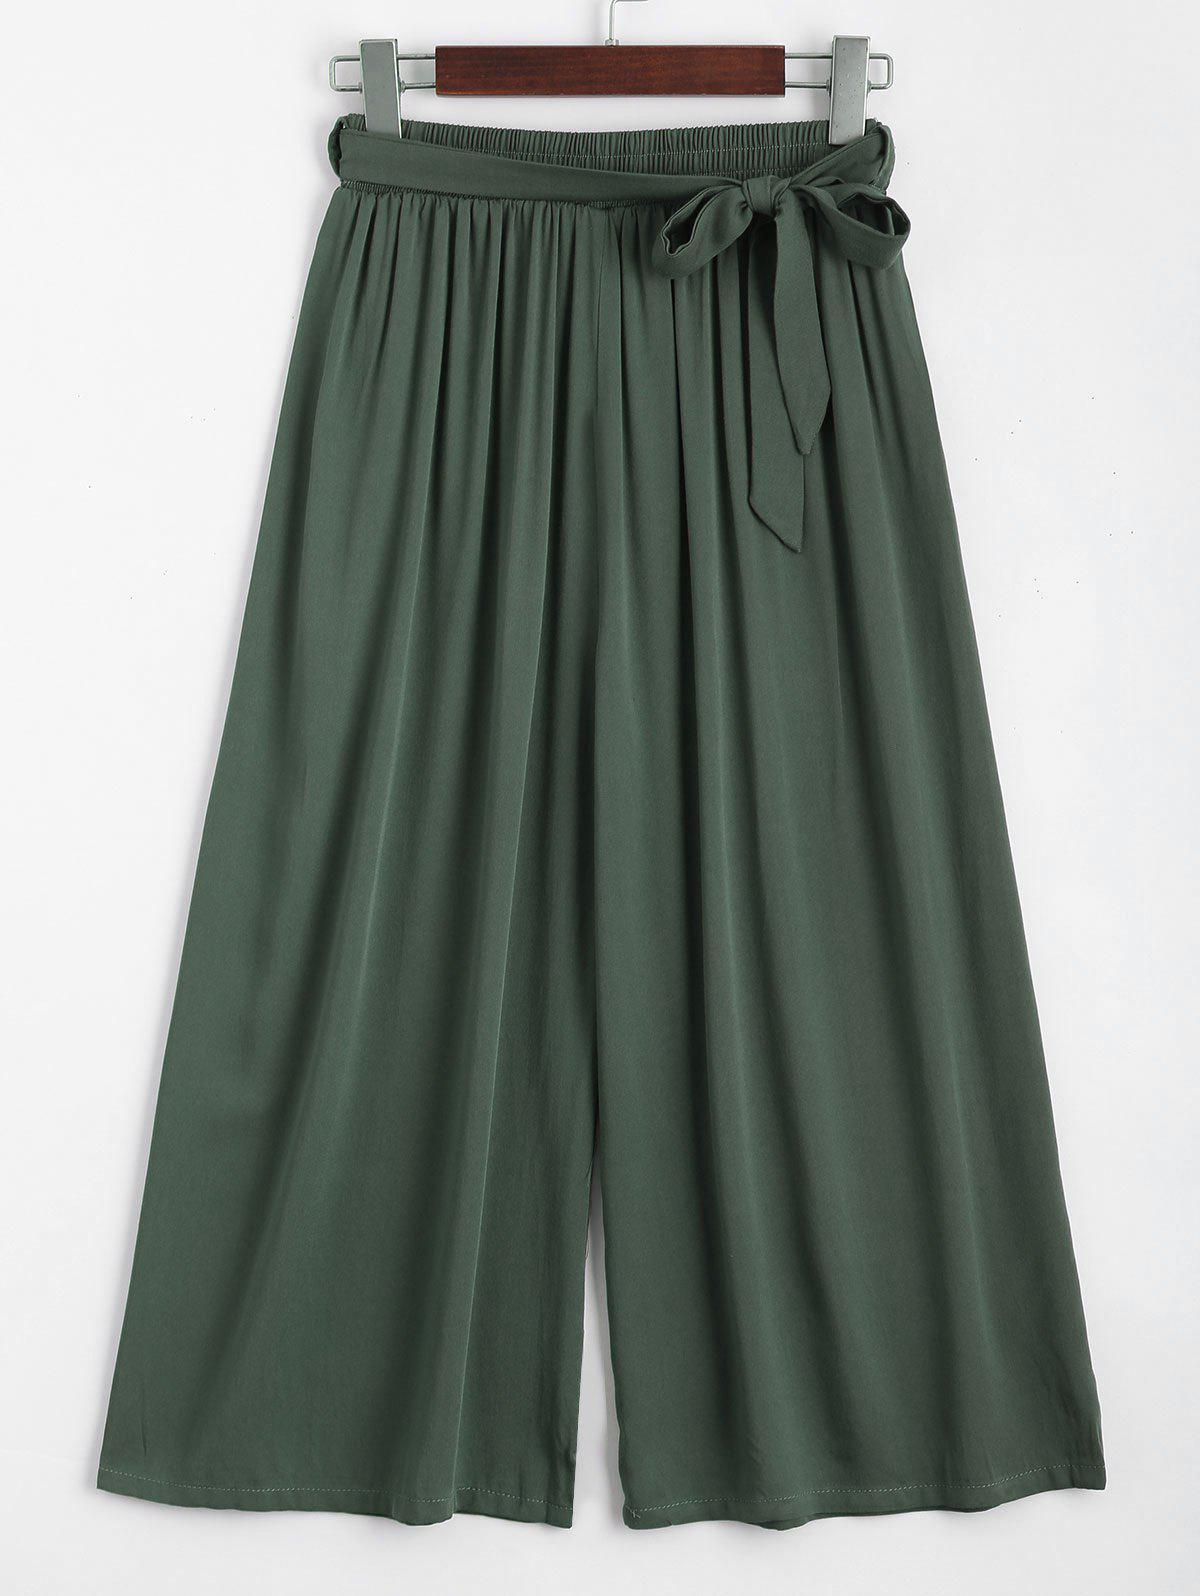 Capri High Waisted Belted Wide Leg Pants 222897205